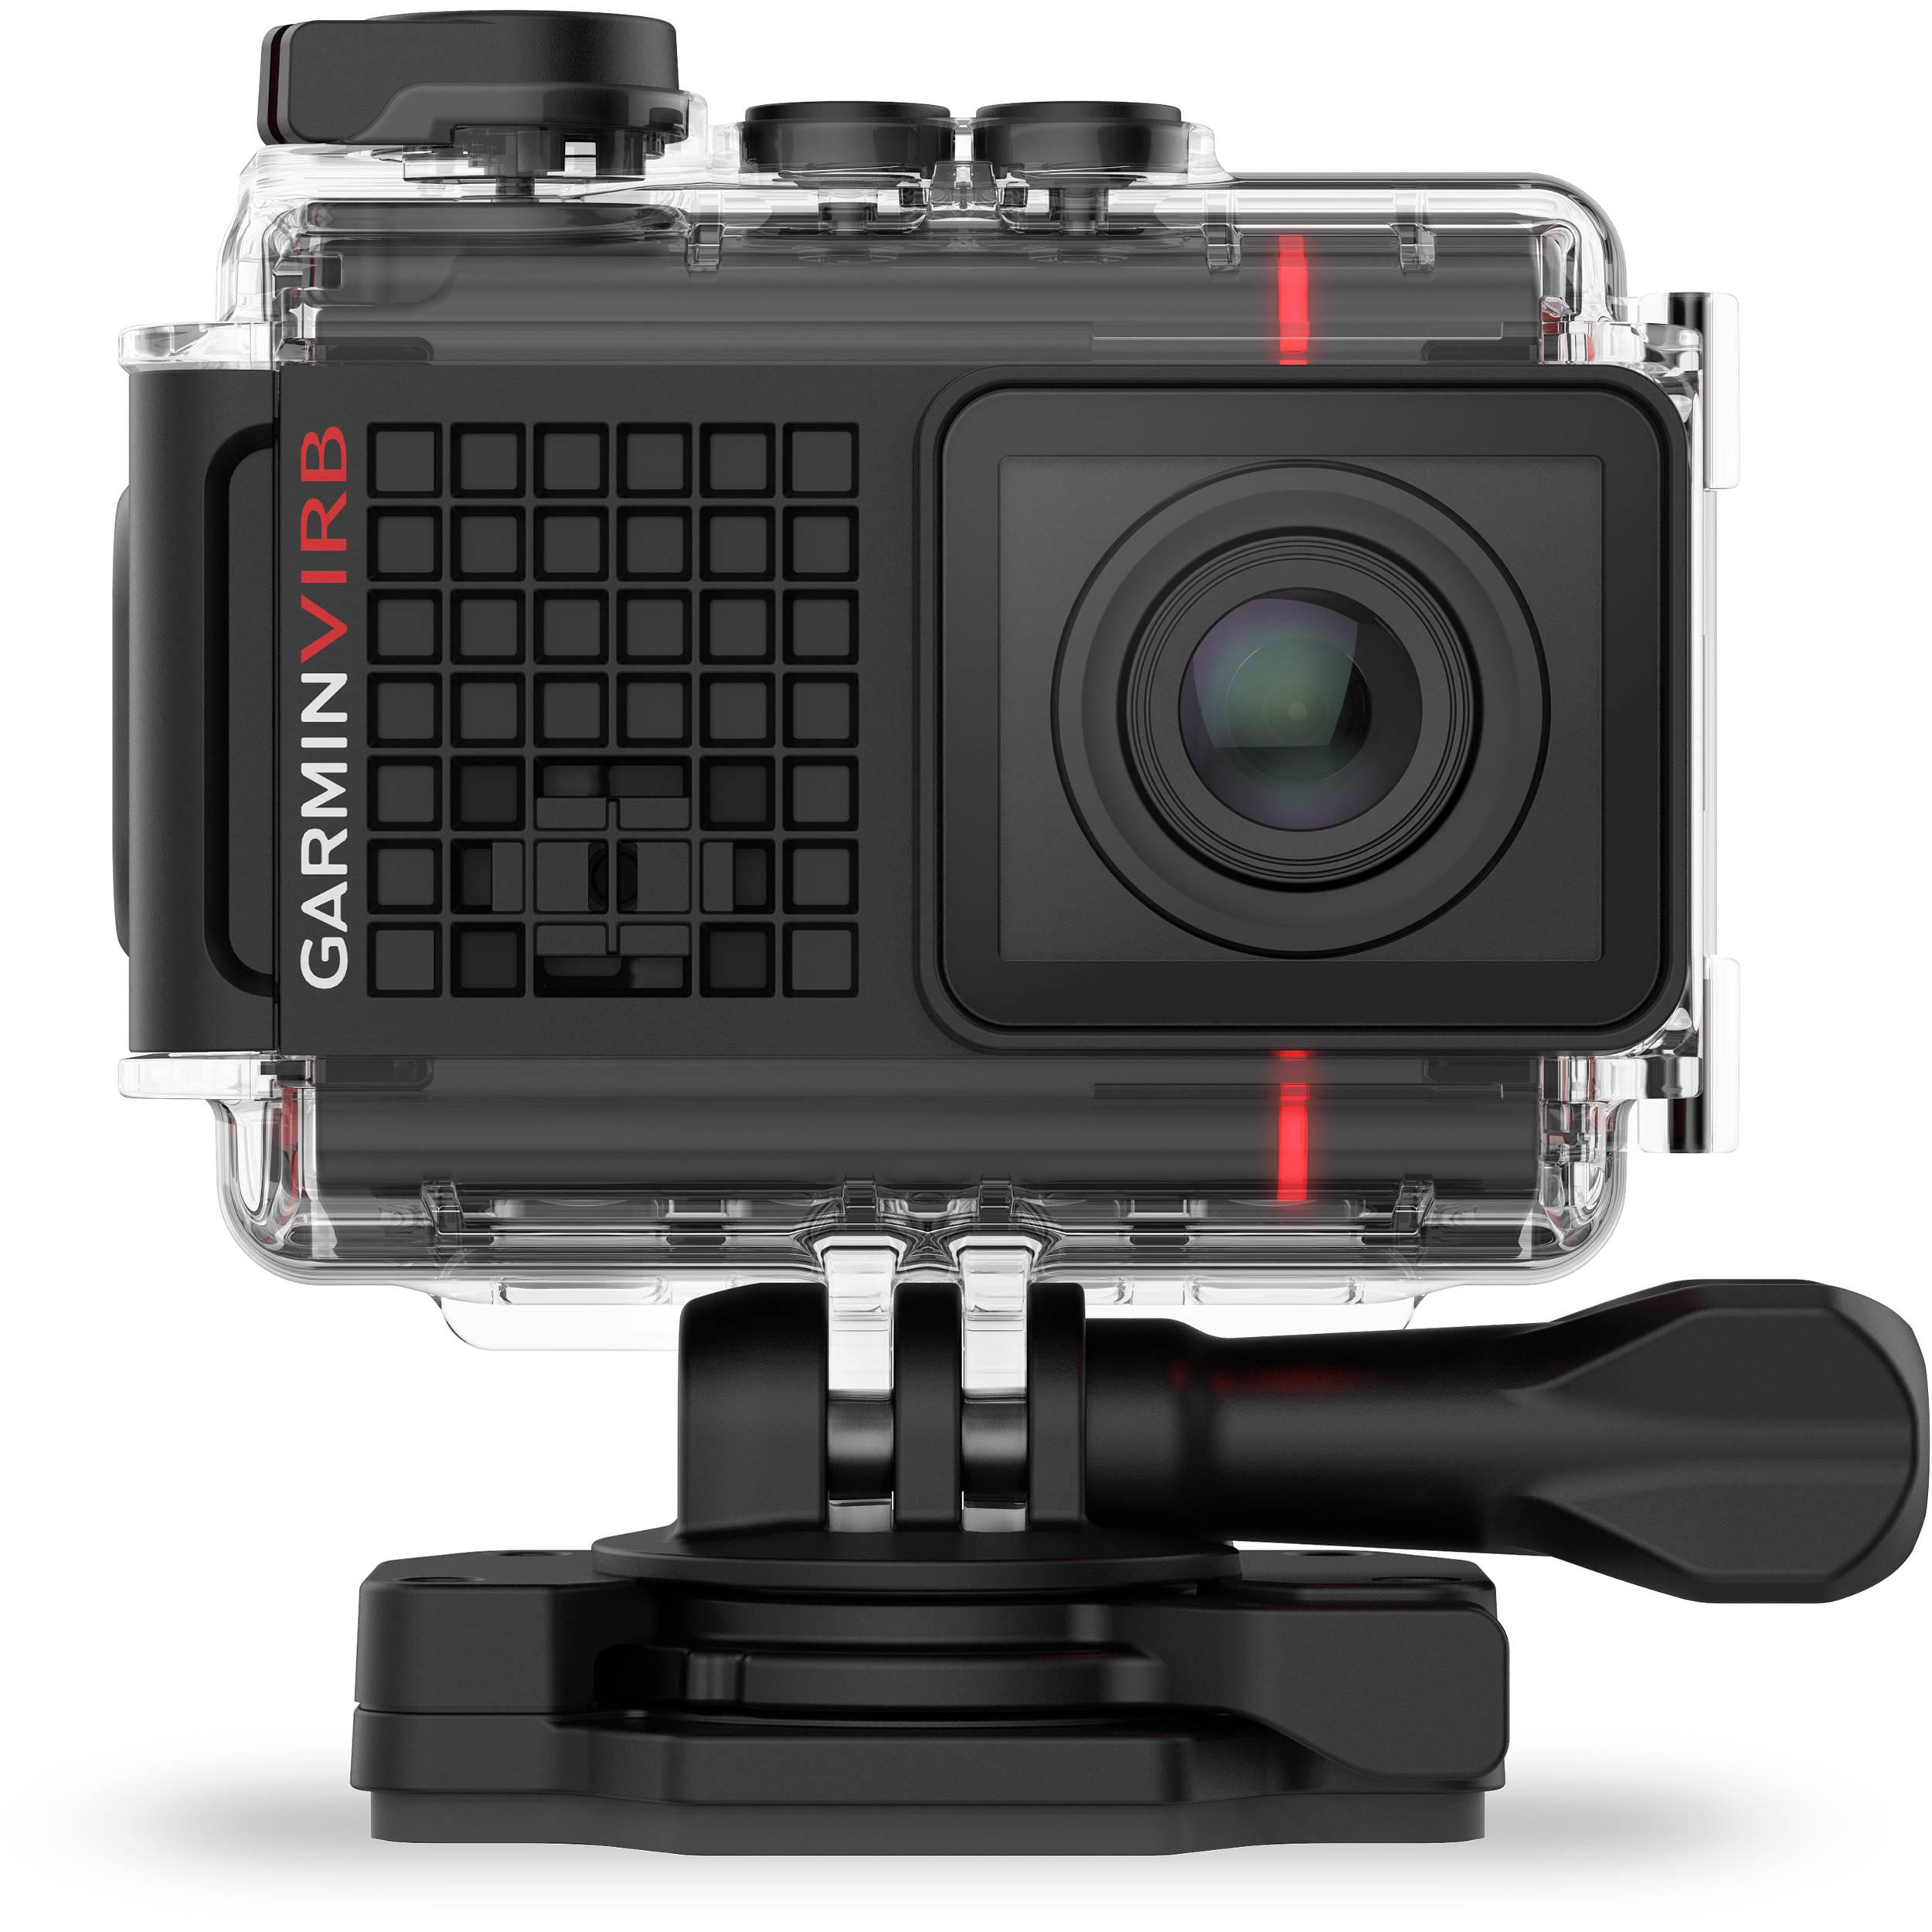 Garmin VIRB Ultra 30 Action Camera 010-01529-03 B&H Photo Video